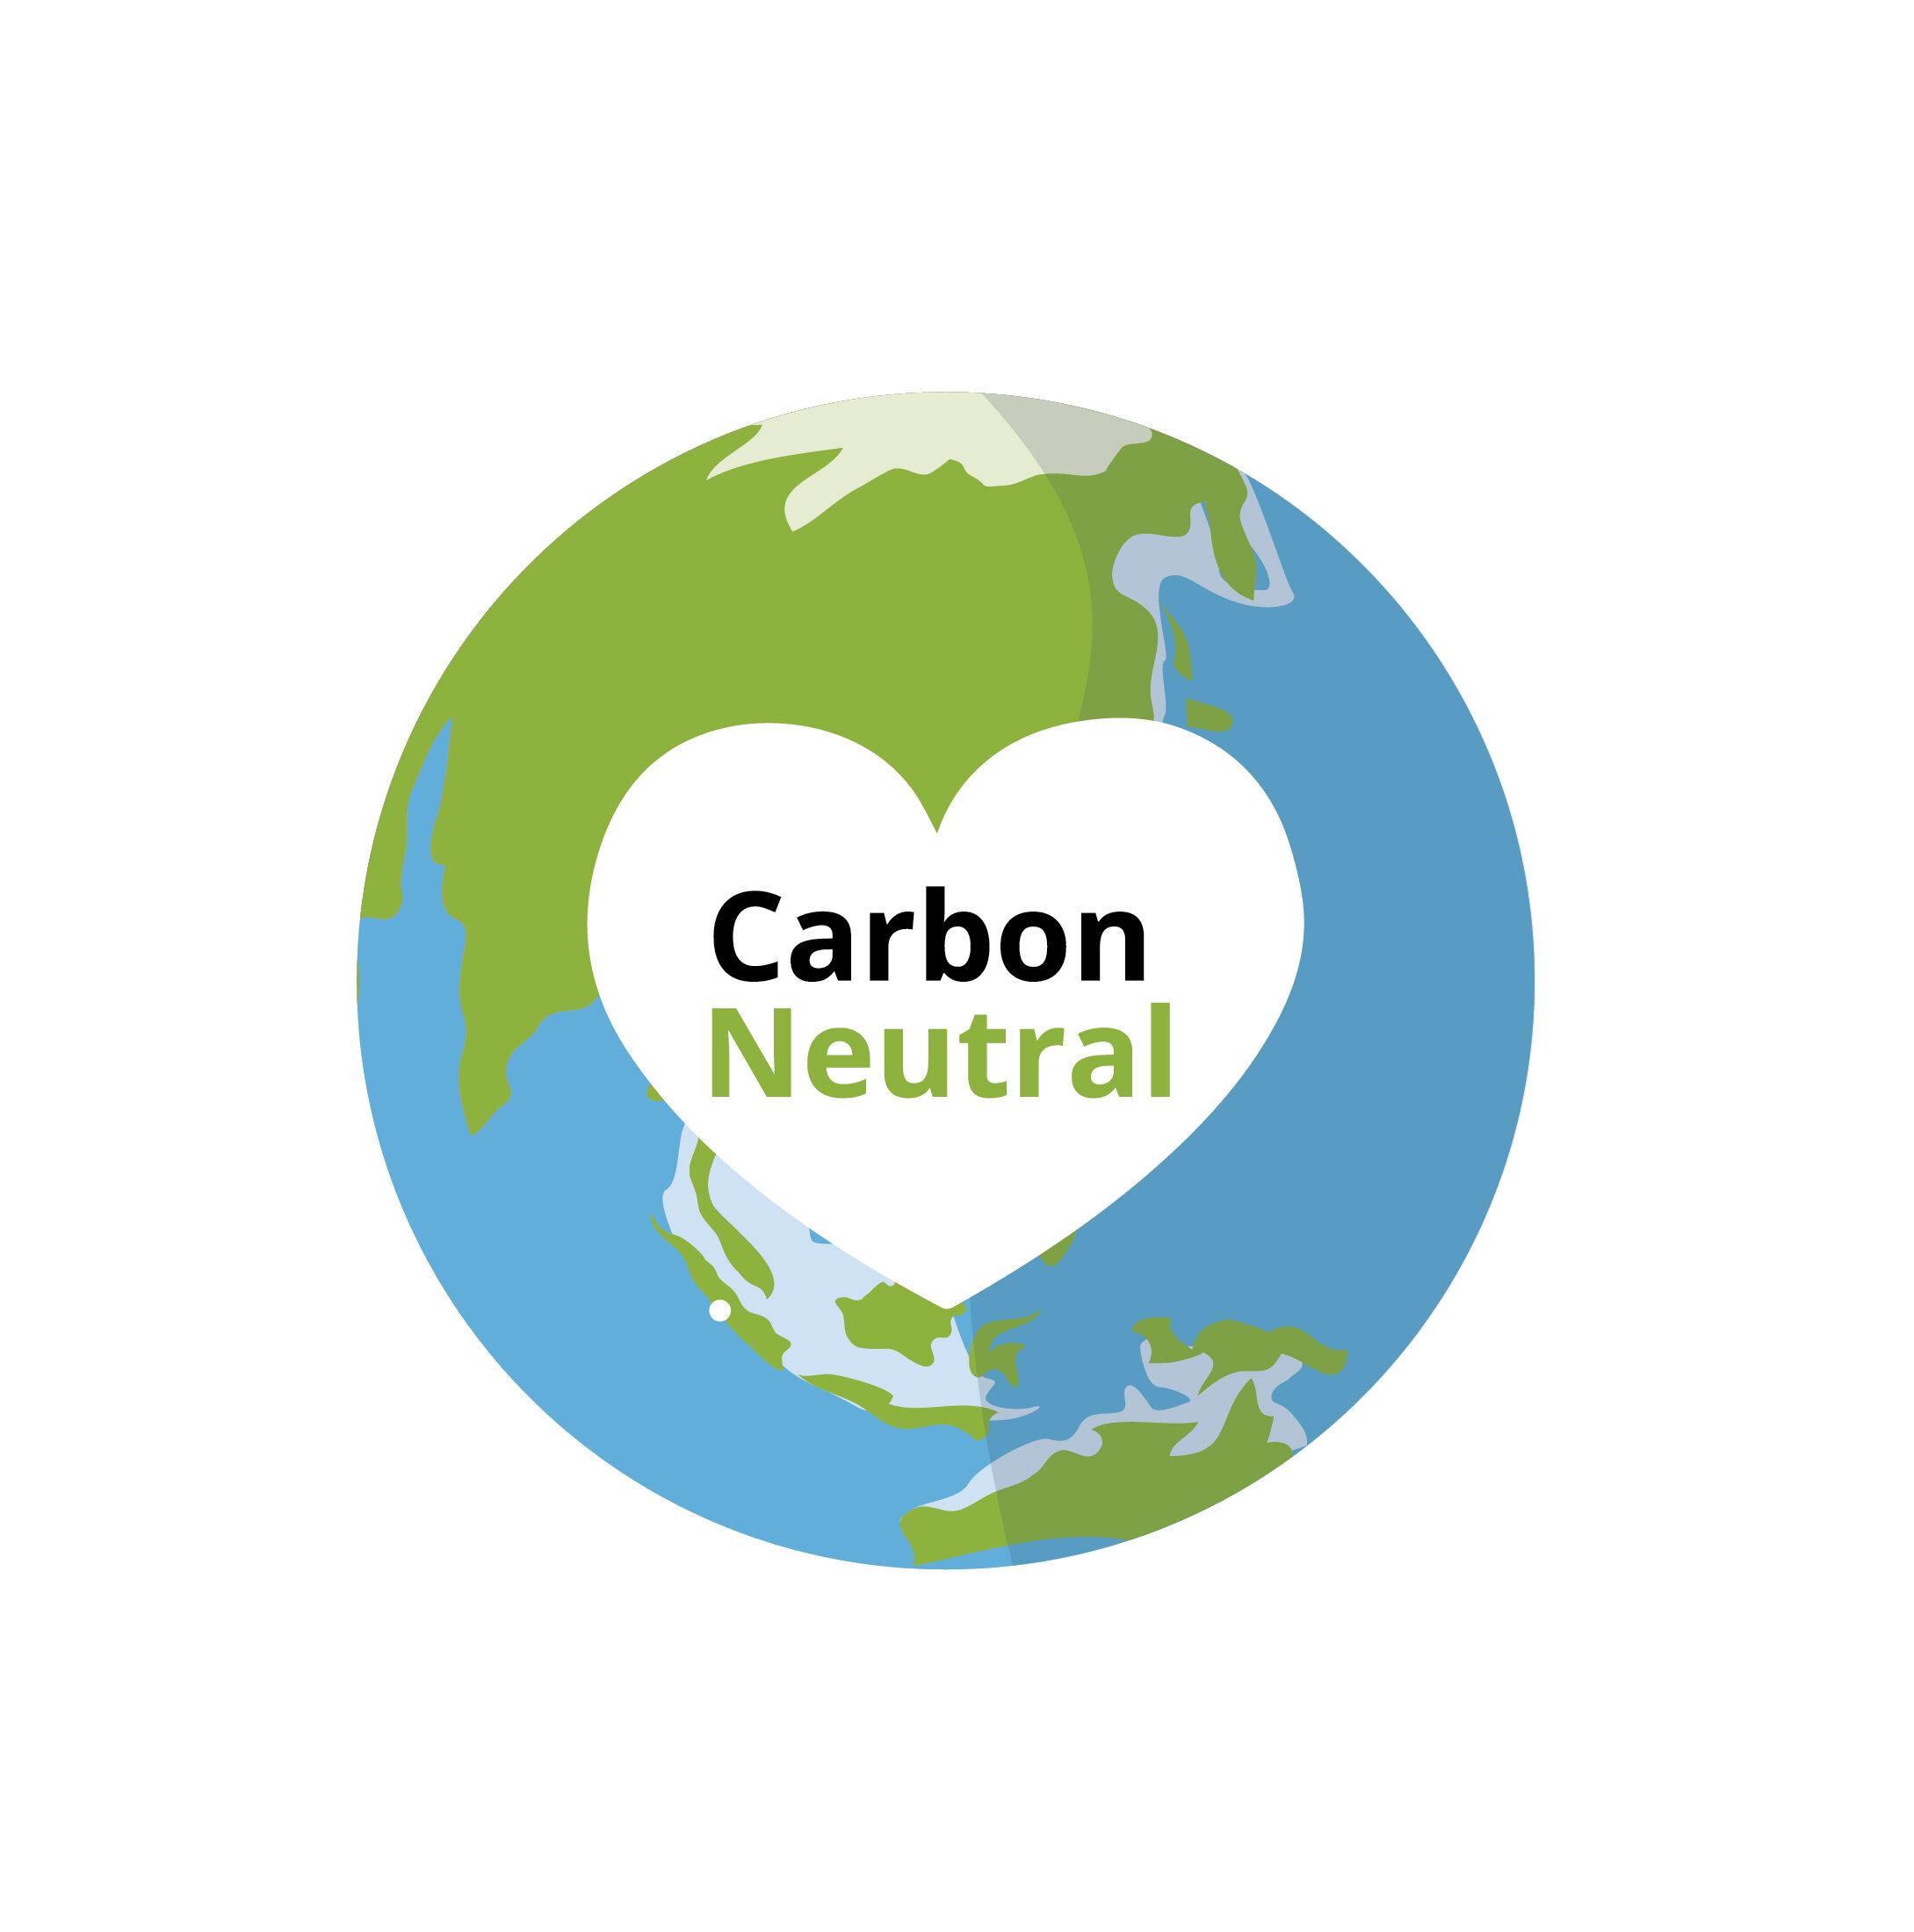 CarbonNeutrallogo-01.jpg